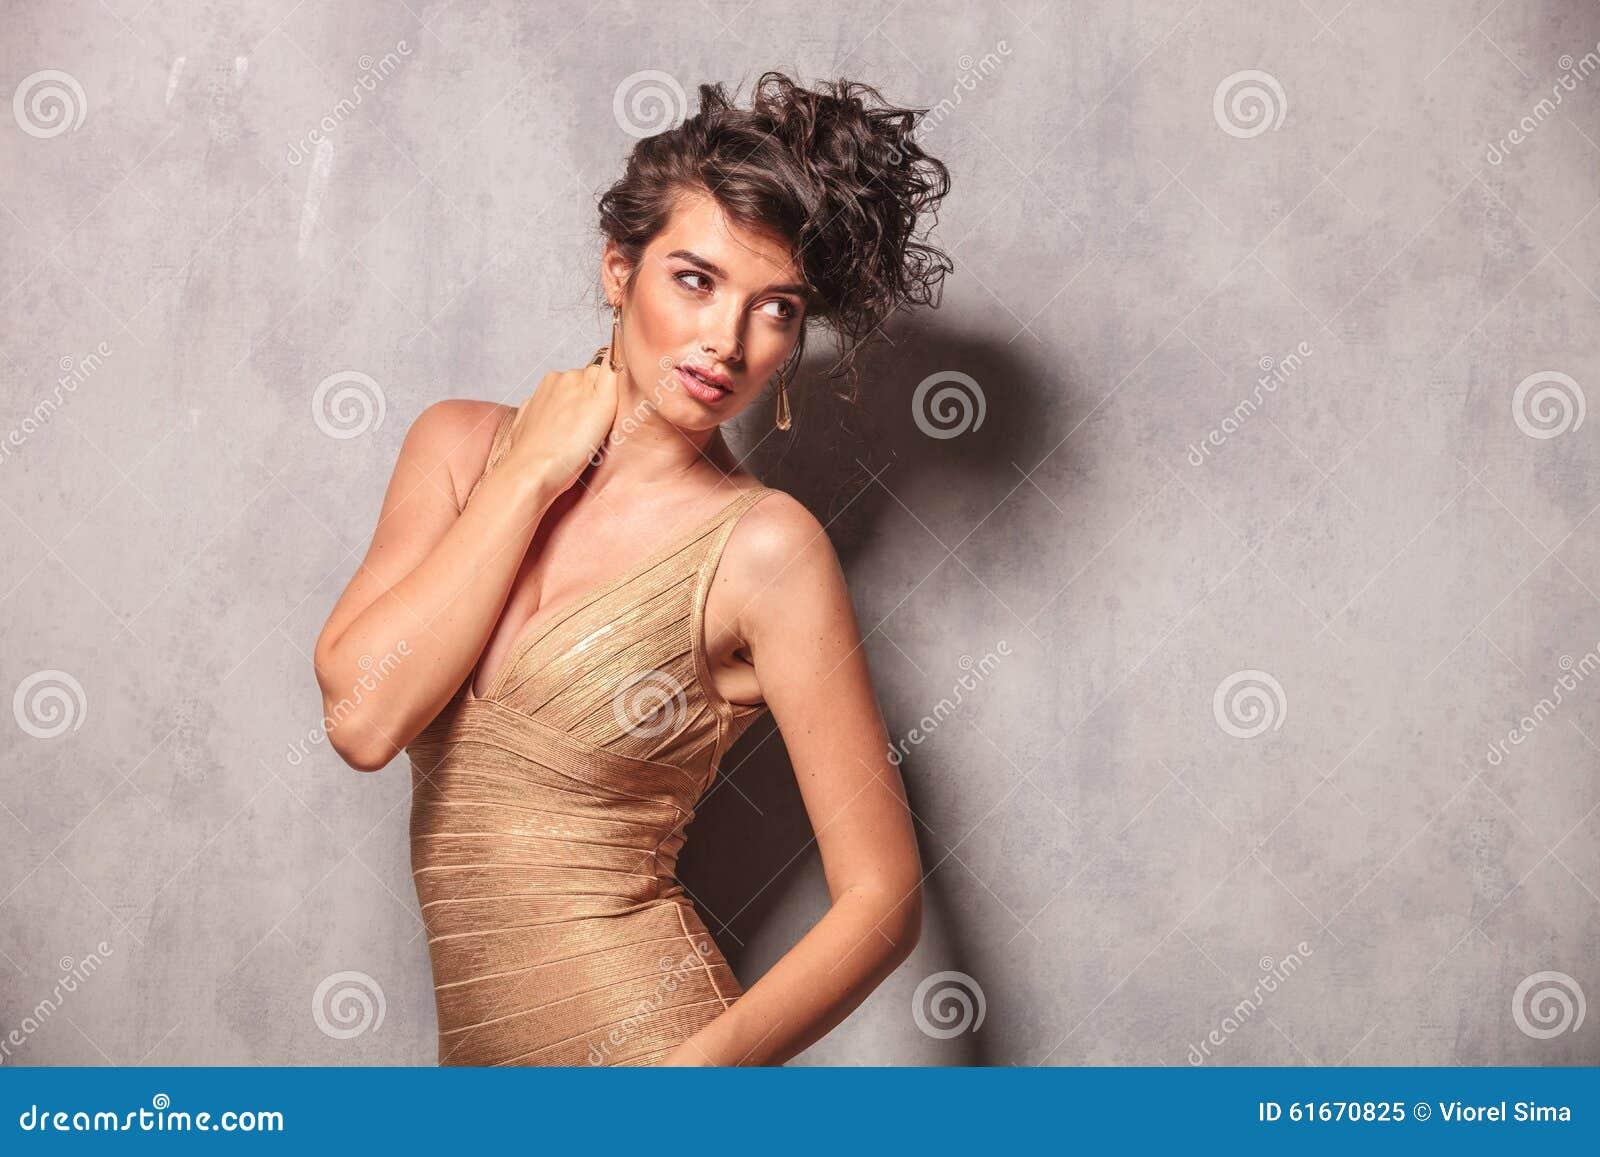 Vidhya balan nude nipple hot